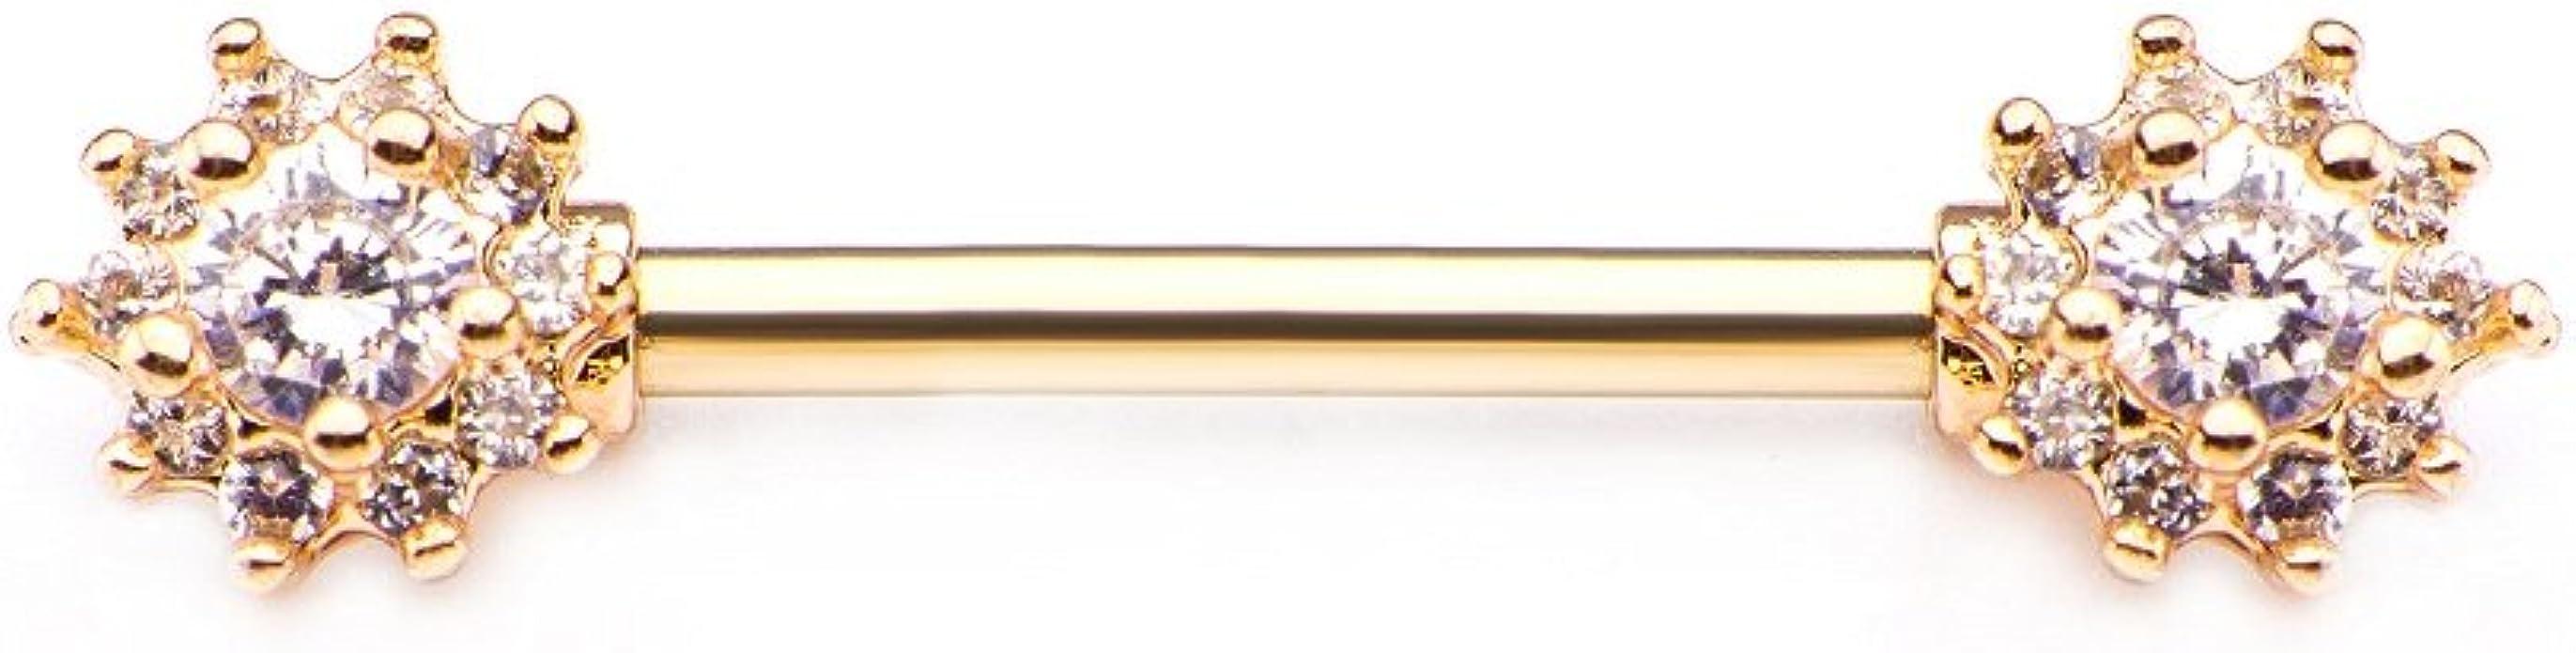 GranTodo 316 Surgical Steel 14g 9//16 Nipple Barbells Forward Facing Prong Set Diamond Shape CZ Gem